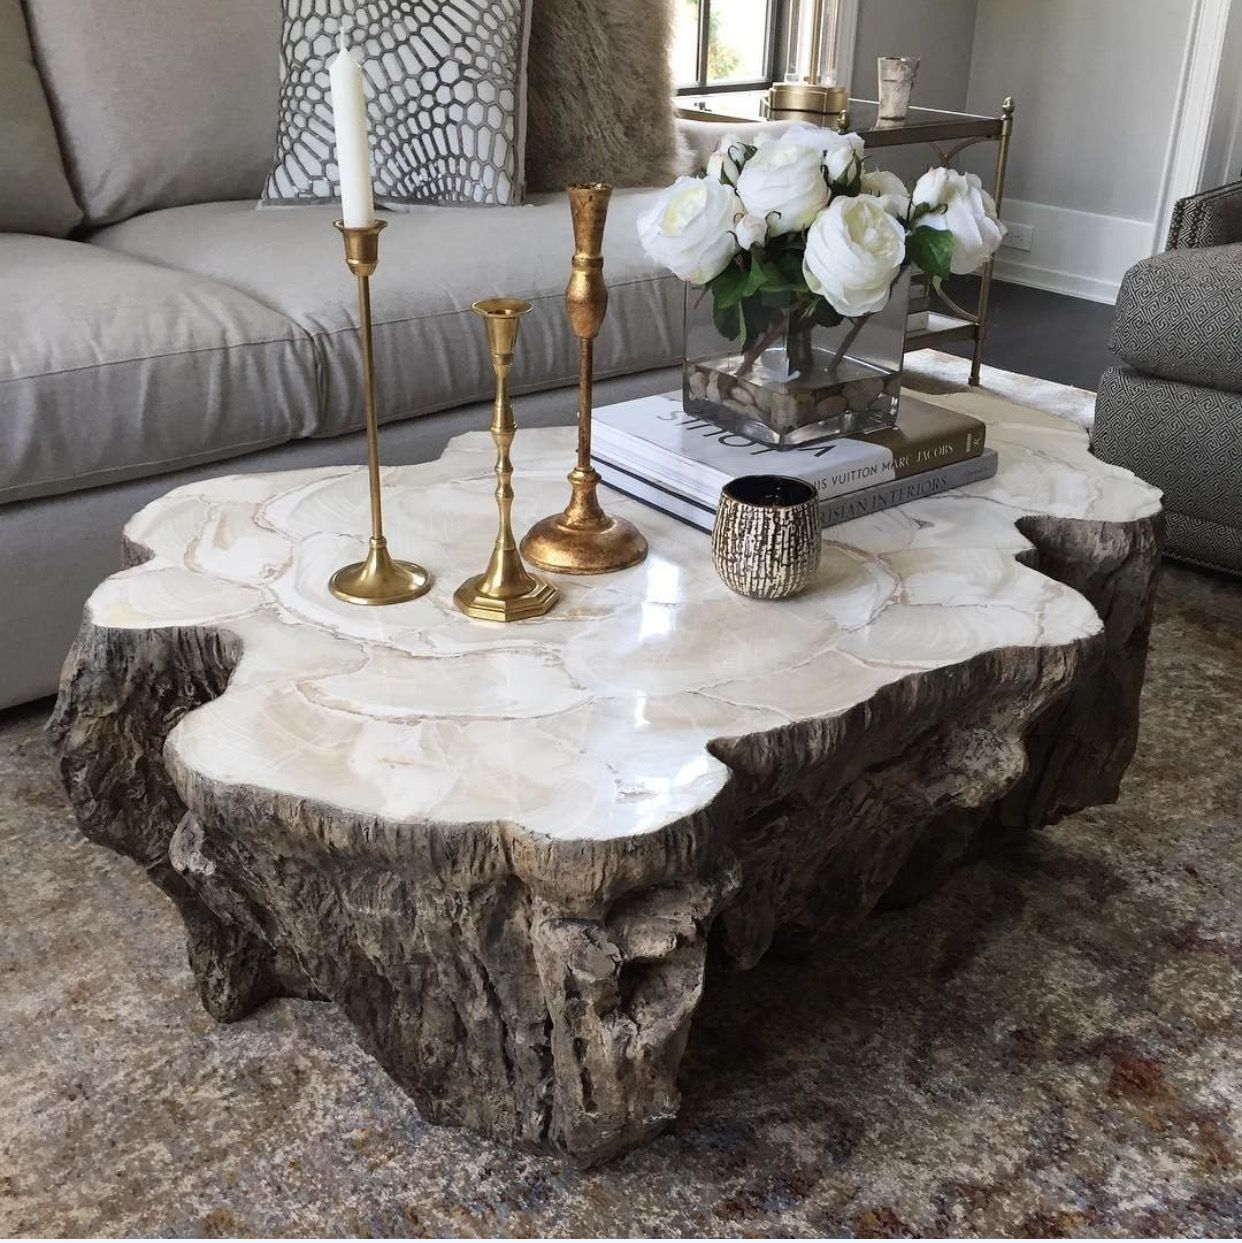 petrified wood coffee table 4 500 wood coffee table on stunning wooden metal coffee table id=53615